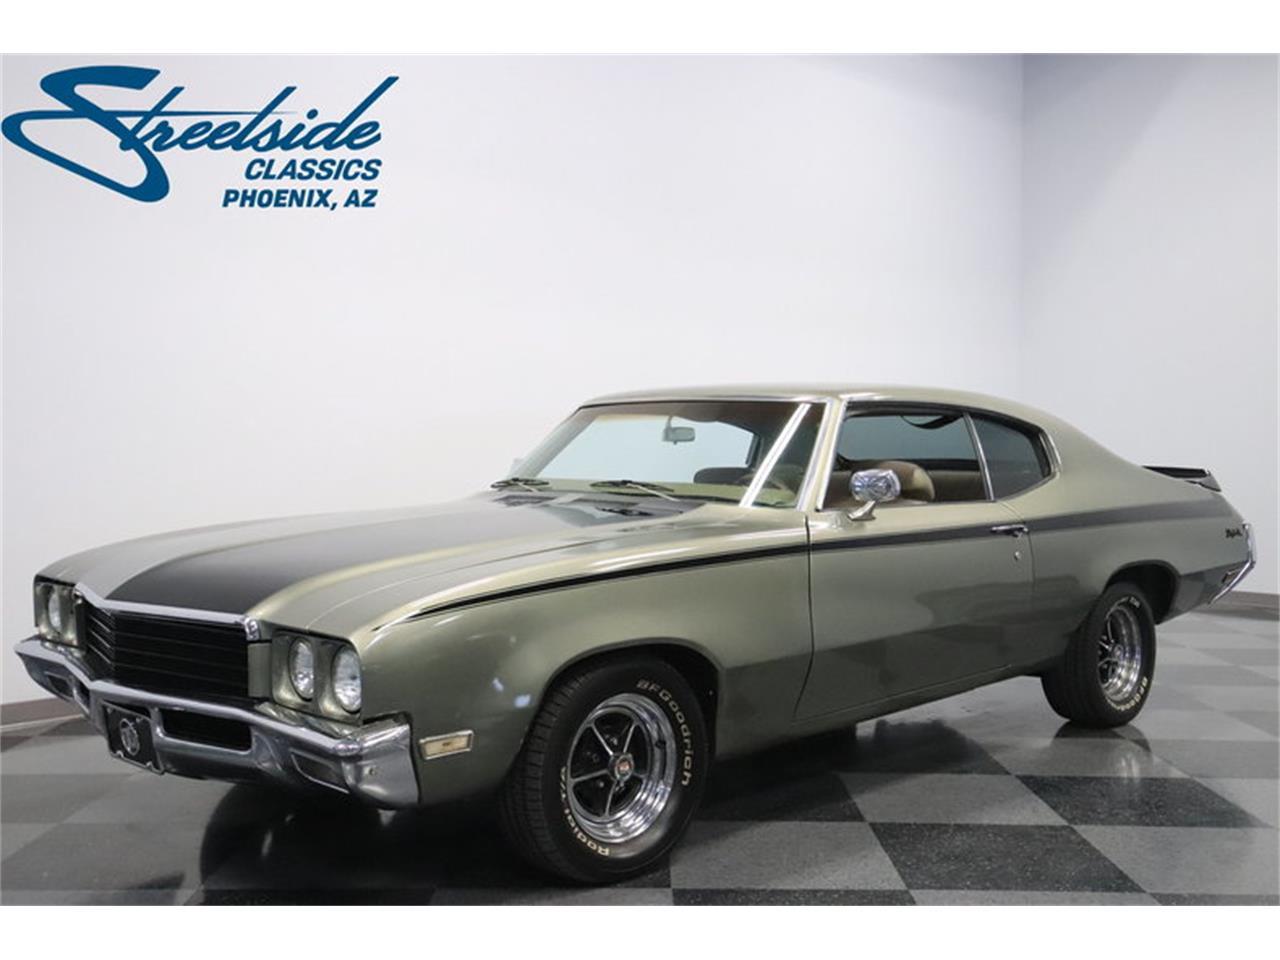 1971 buick skylark for sale | classiccars | cc-1081976